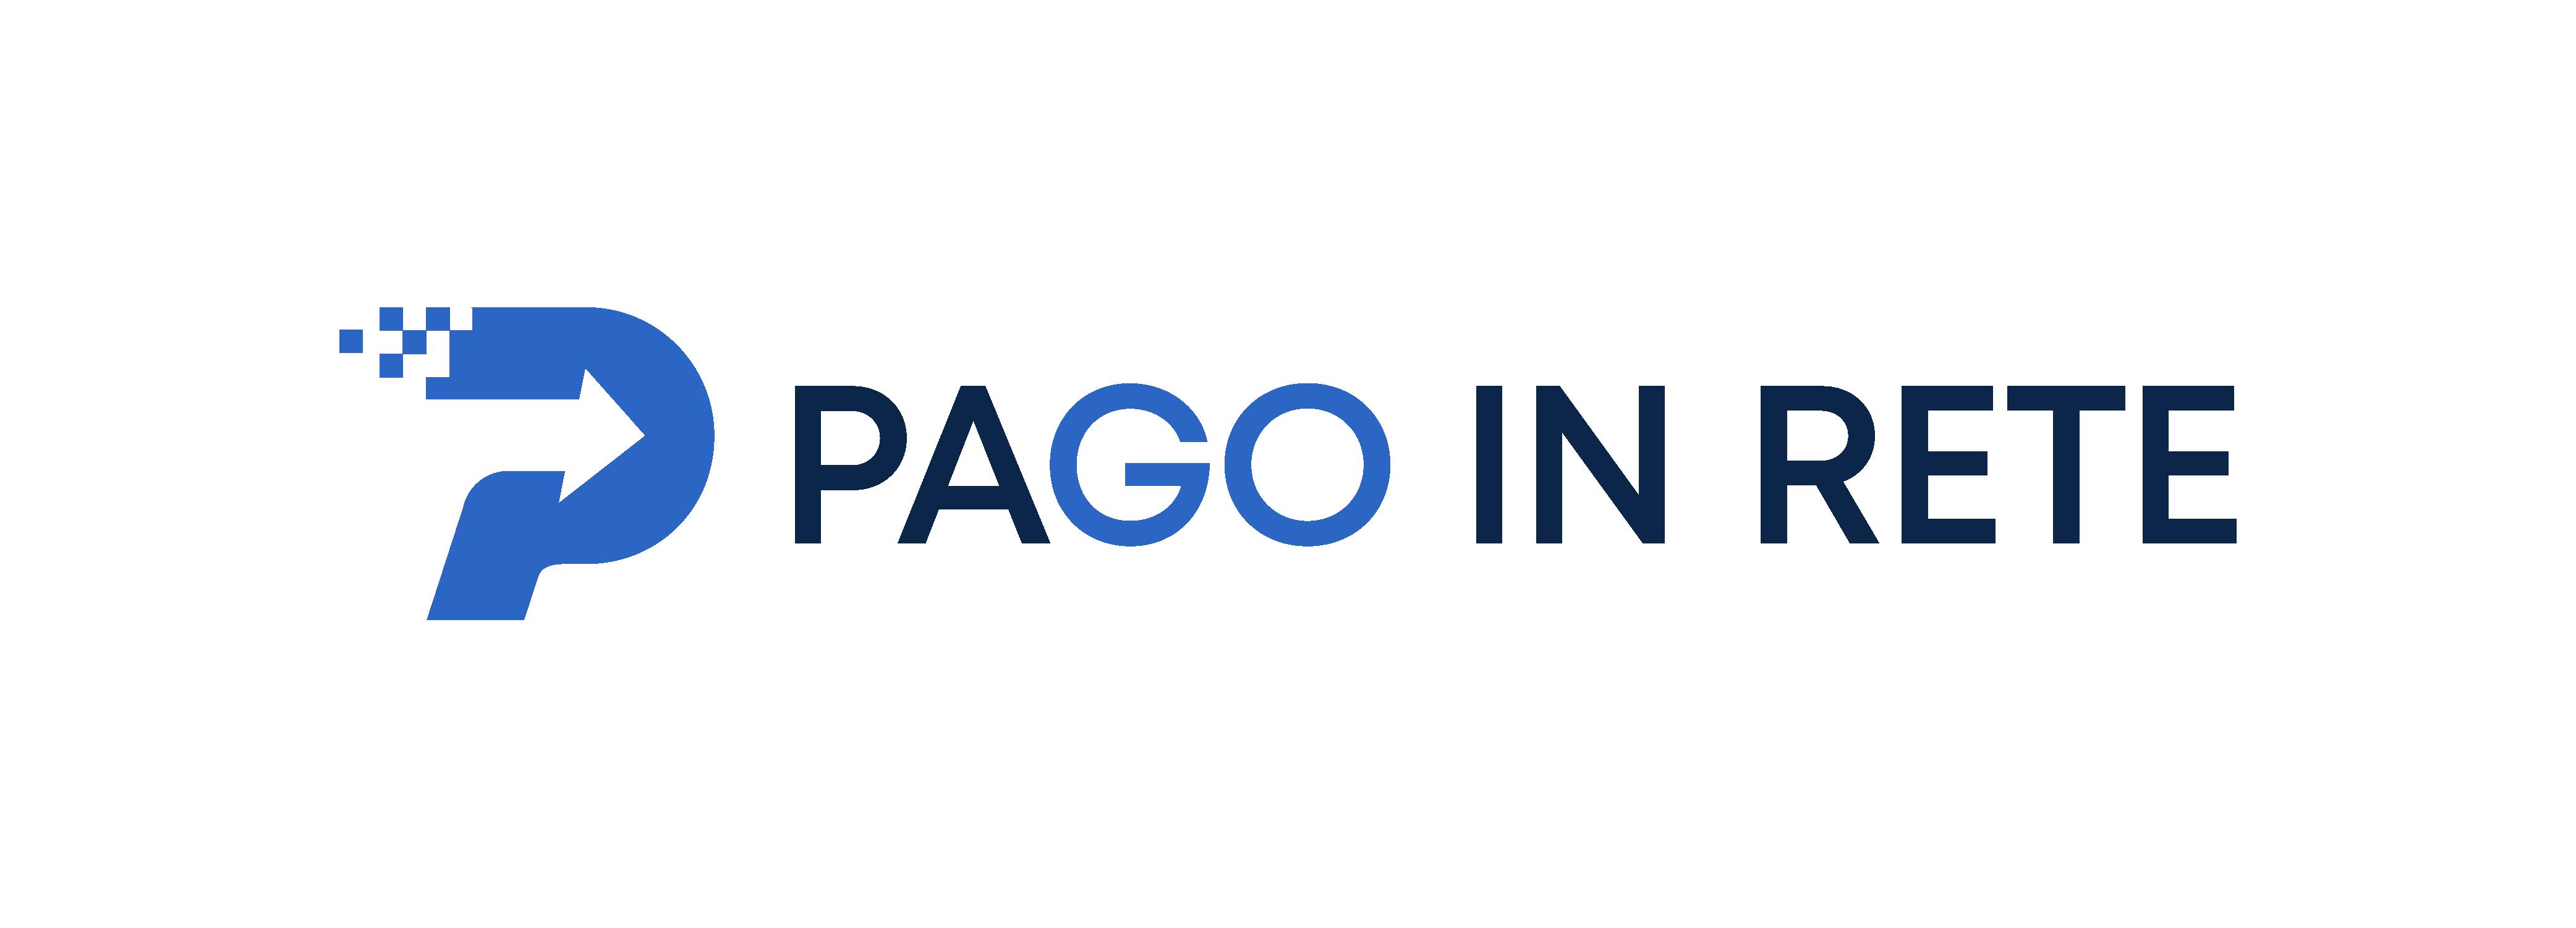 PAGO IN RETE_RGB_positivo-01